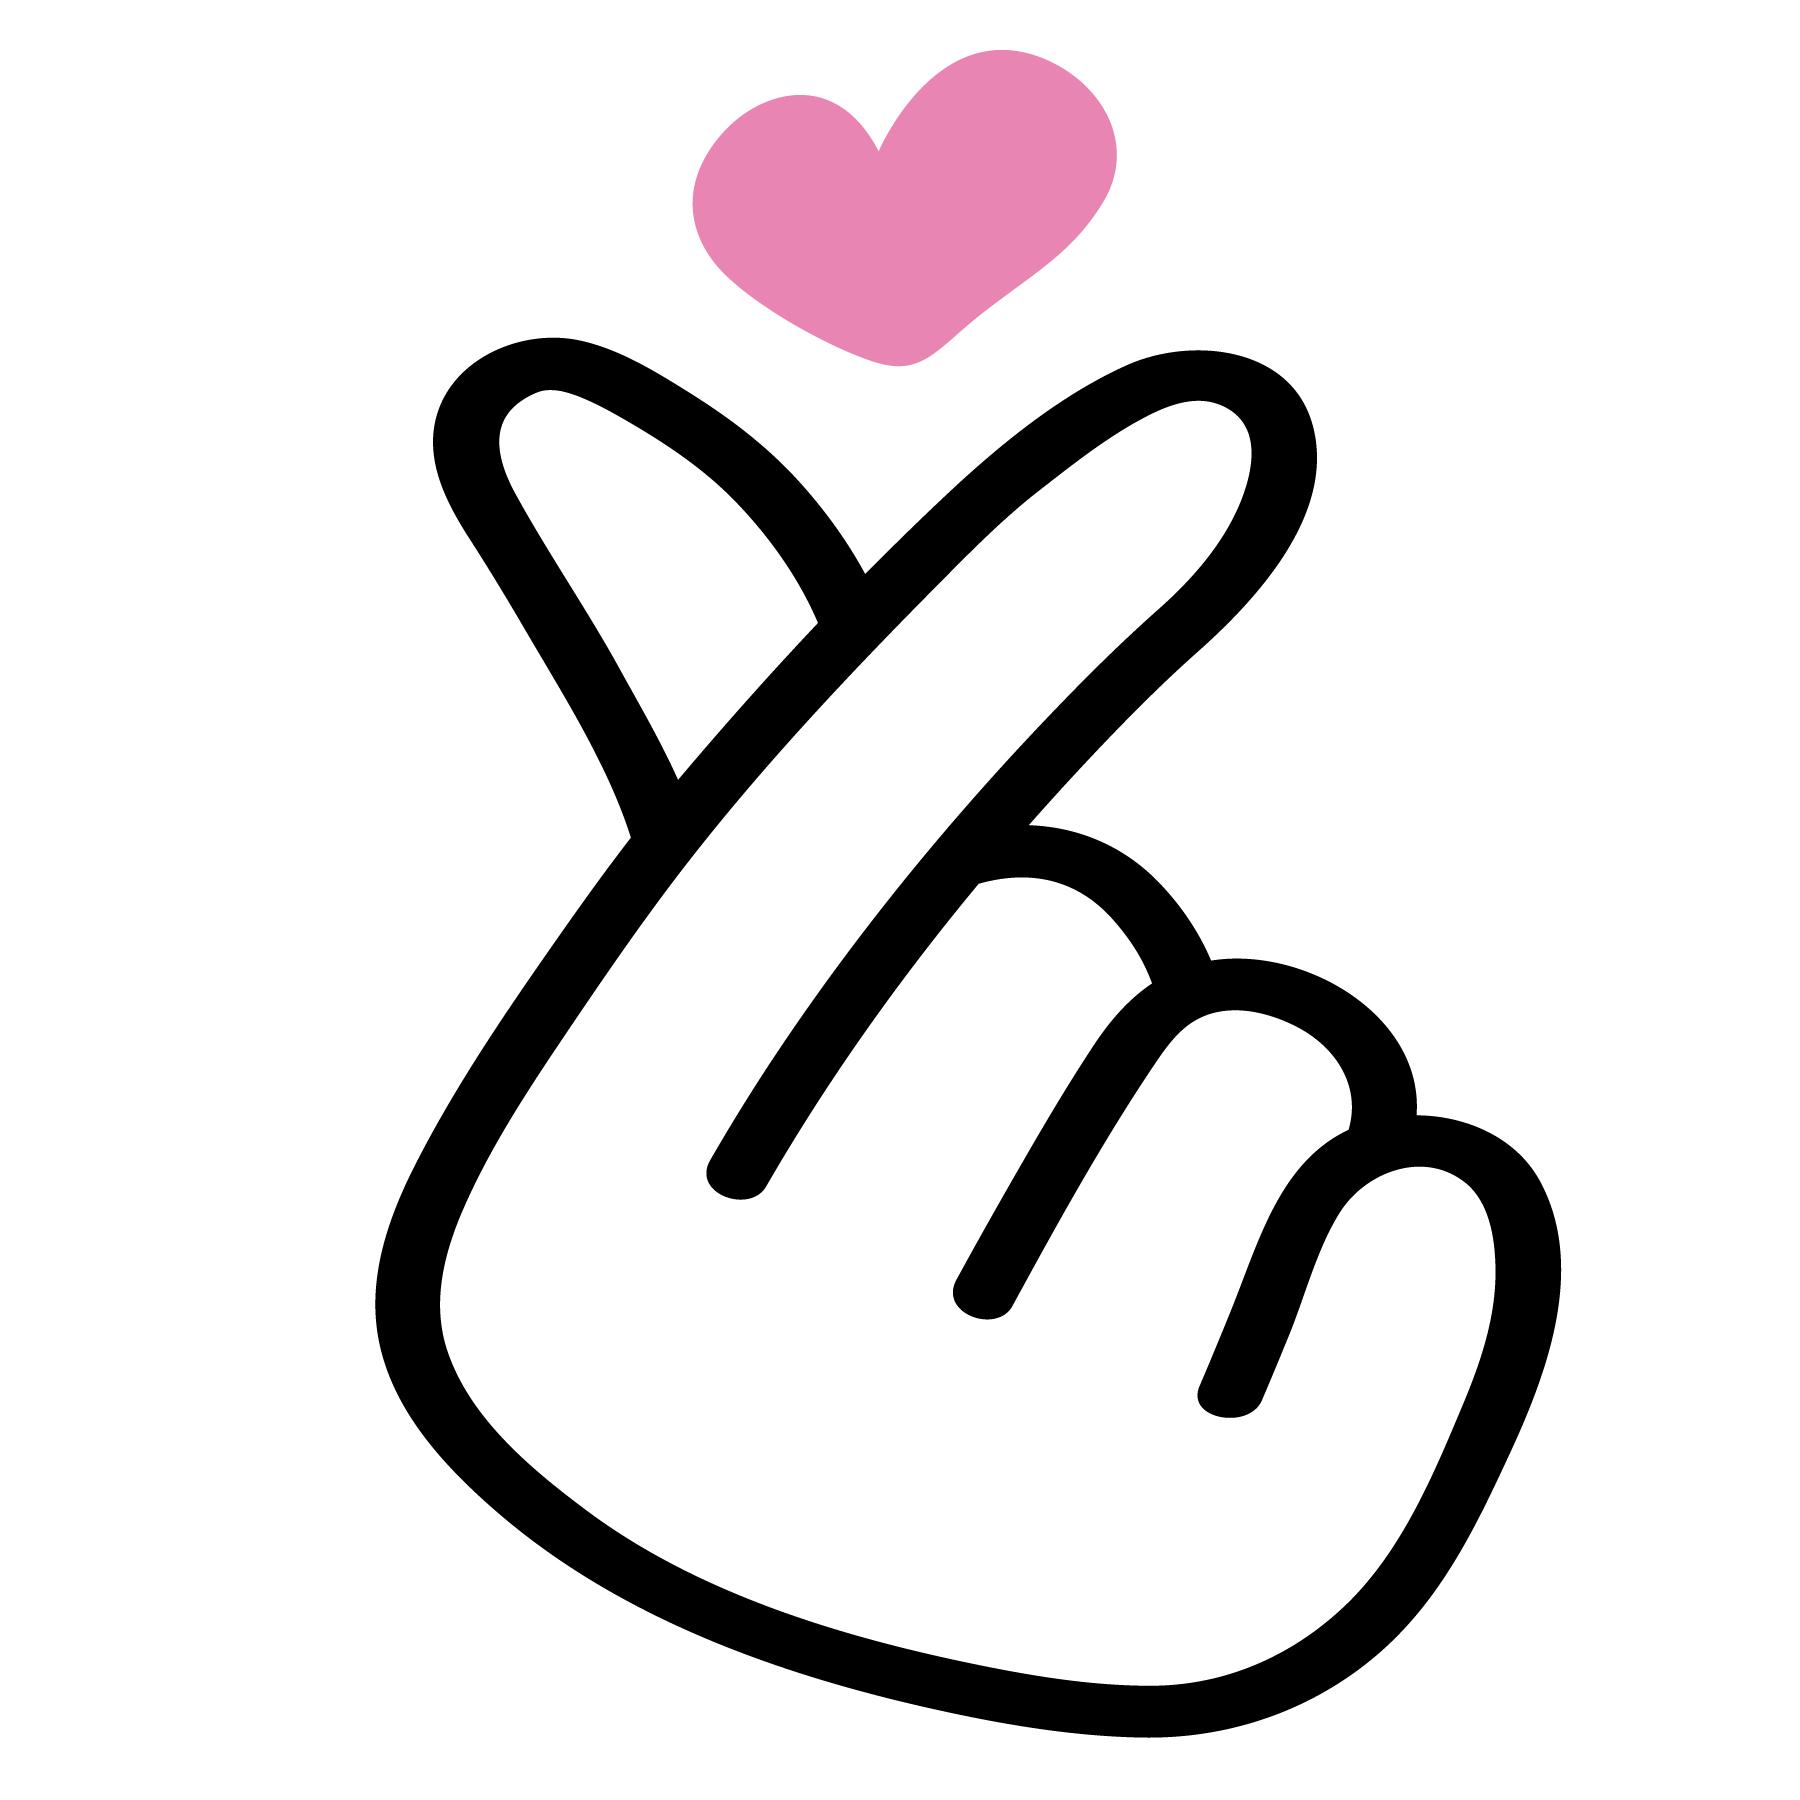 korean fingerheart - Download Free Vectors, Clipart ...